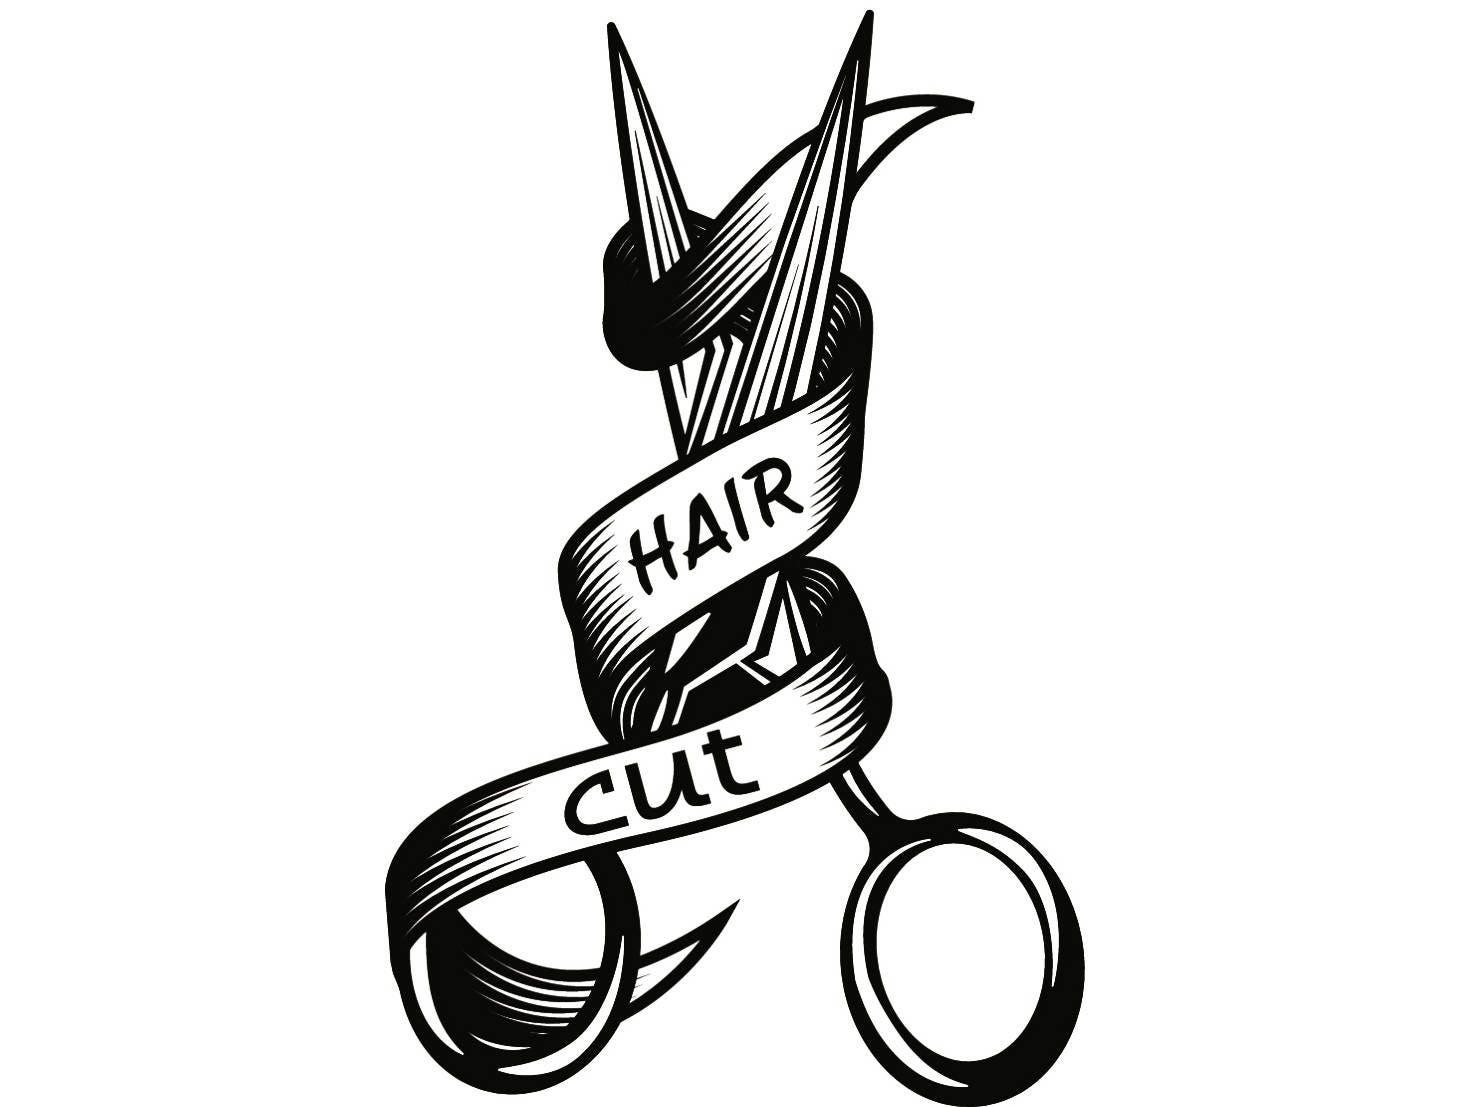 Hairstylist Logo #3 Scissors Salon Barber Shop Haircut ...